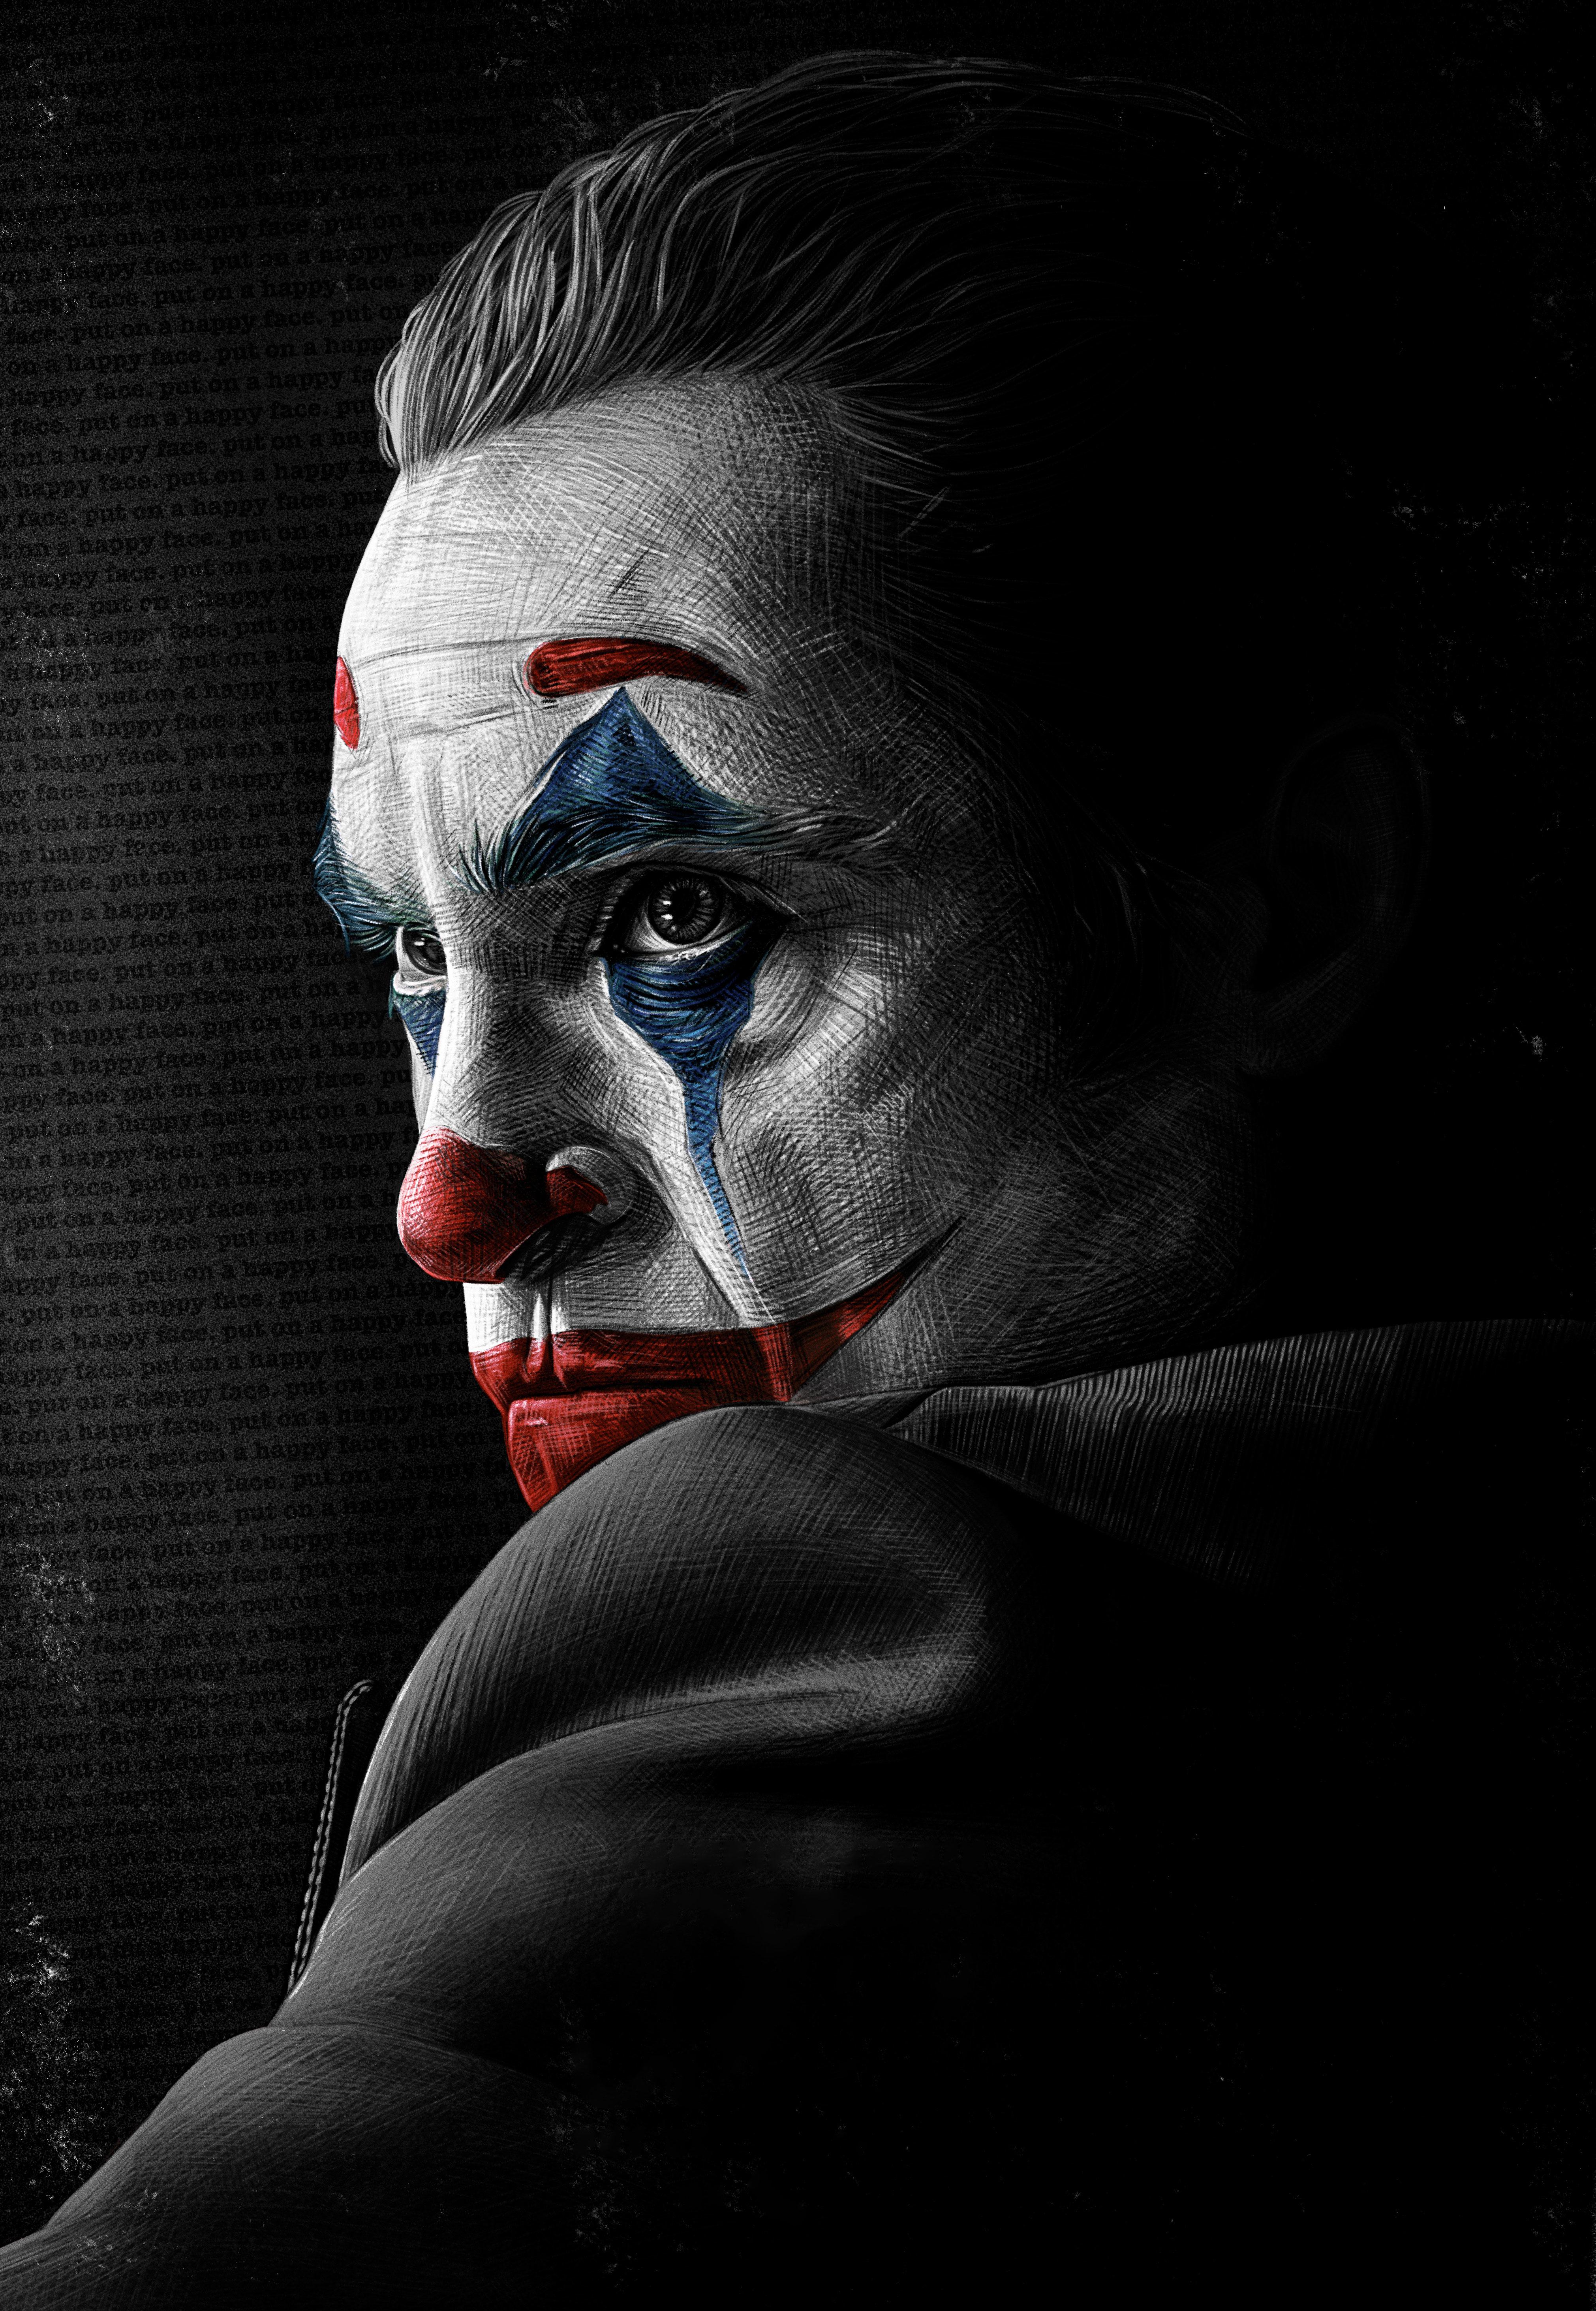 4k Joaquin Phoenix As Joker Wallpaper Hd Artist 4k